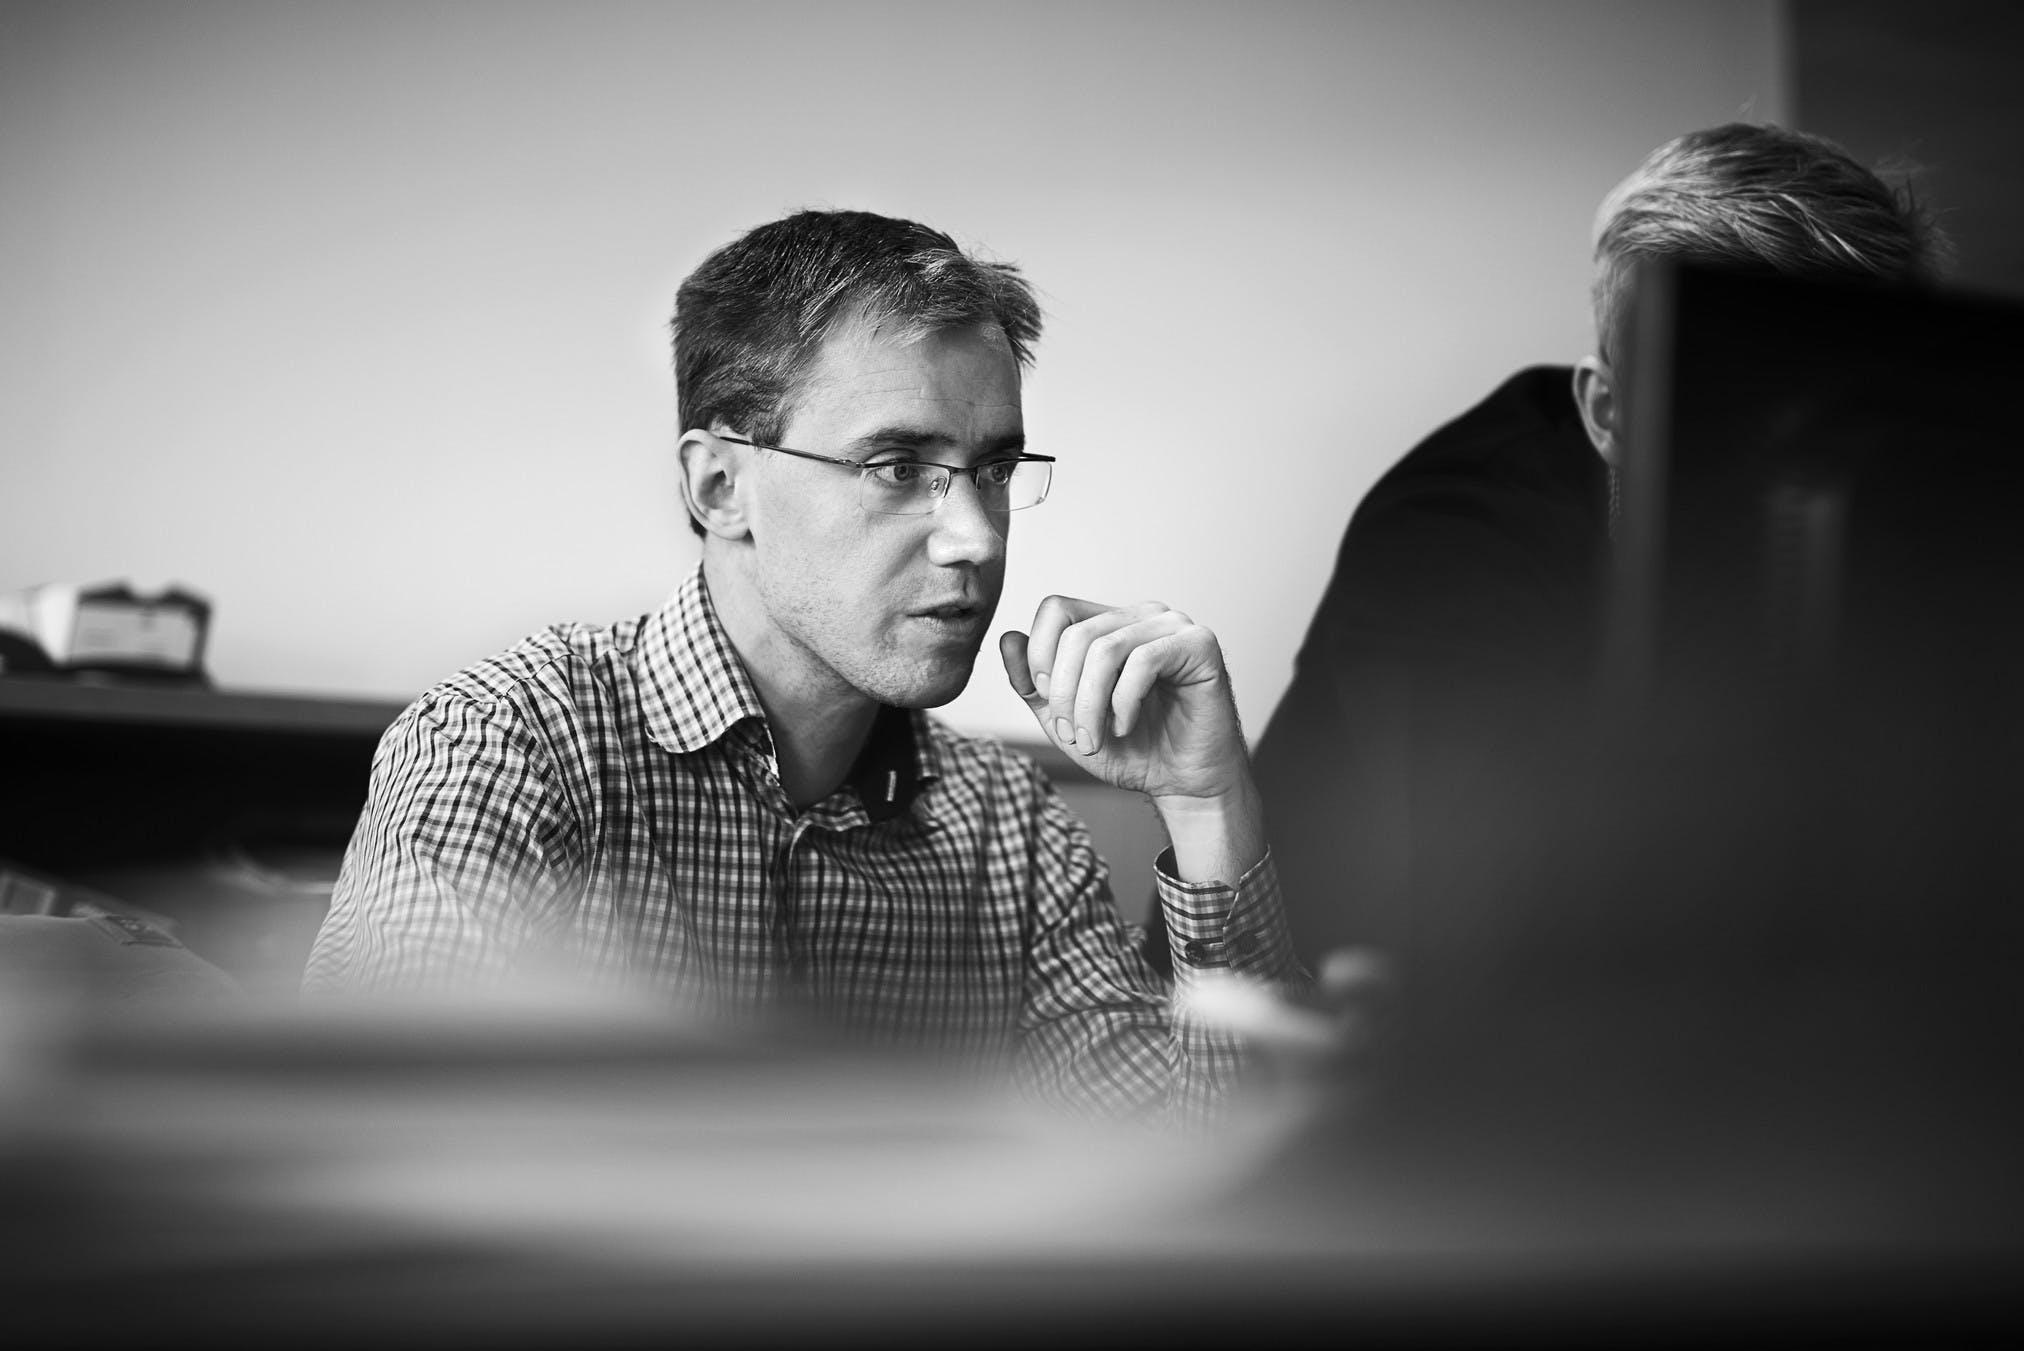 Michael Holm Olesen